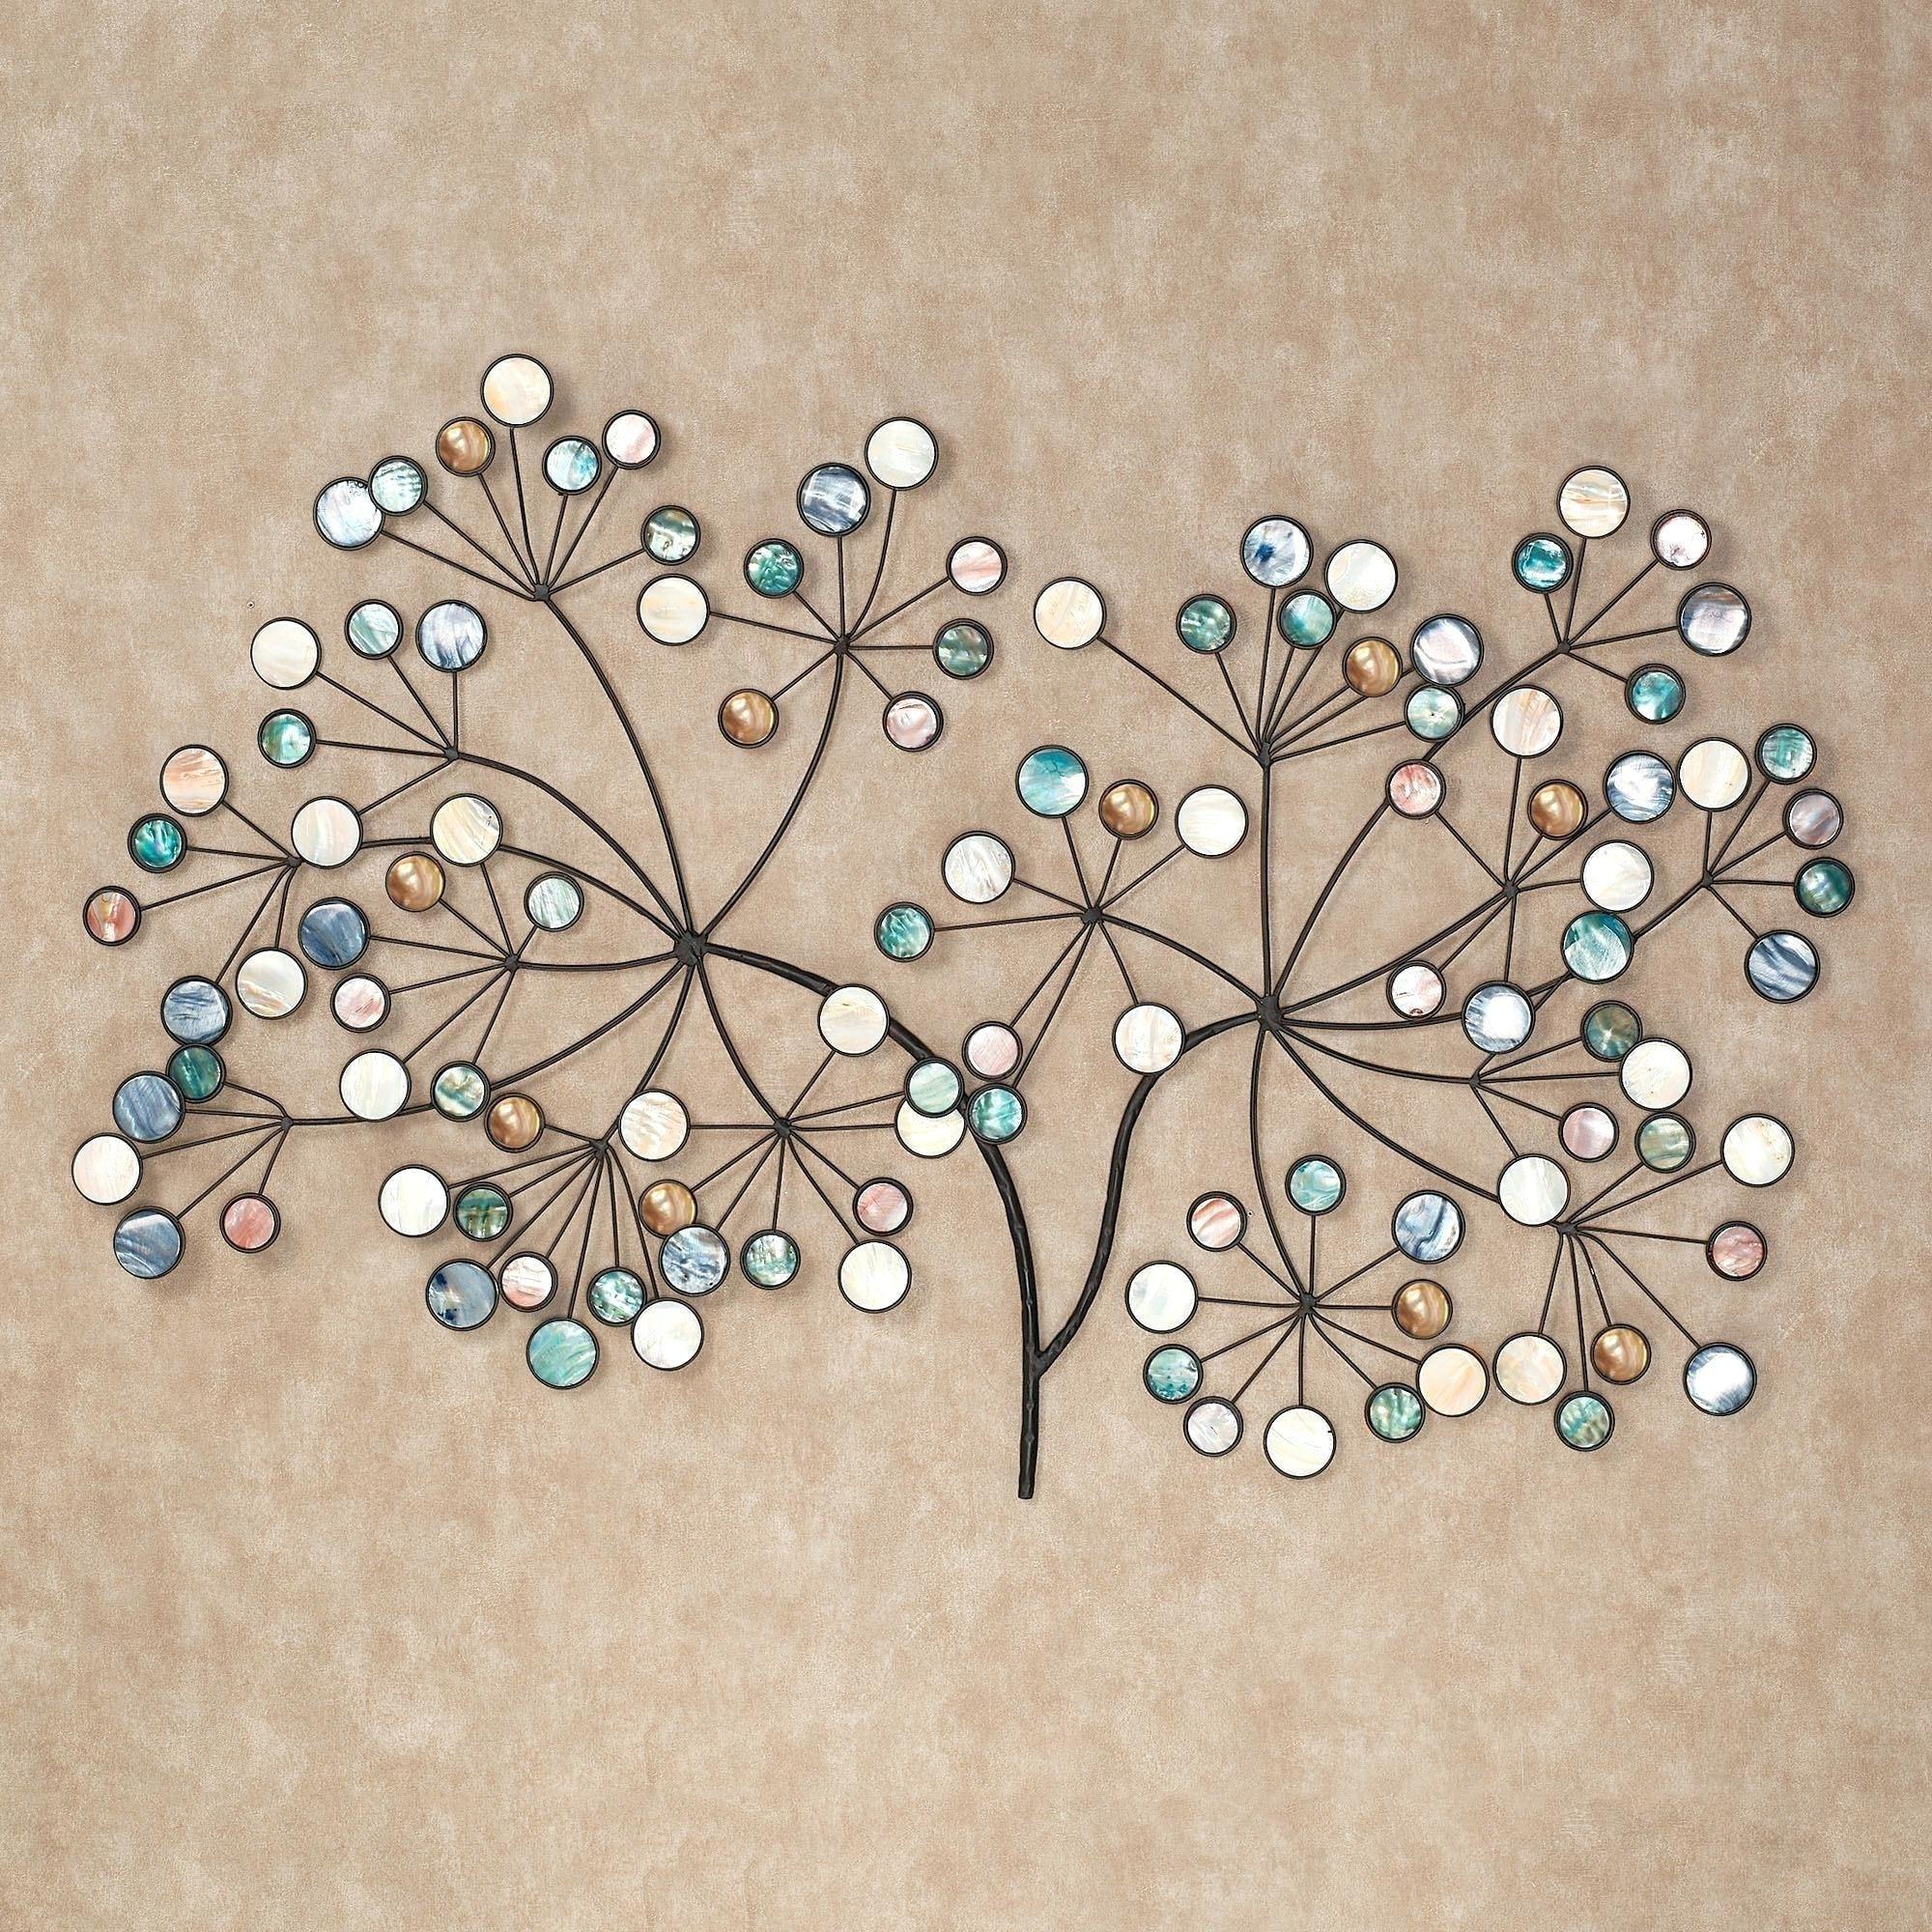 2017 35 Fresh Wall Art Inspiration Of Mirror Mosaic Wall Art (View 20 of 20)